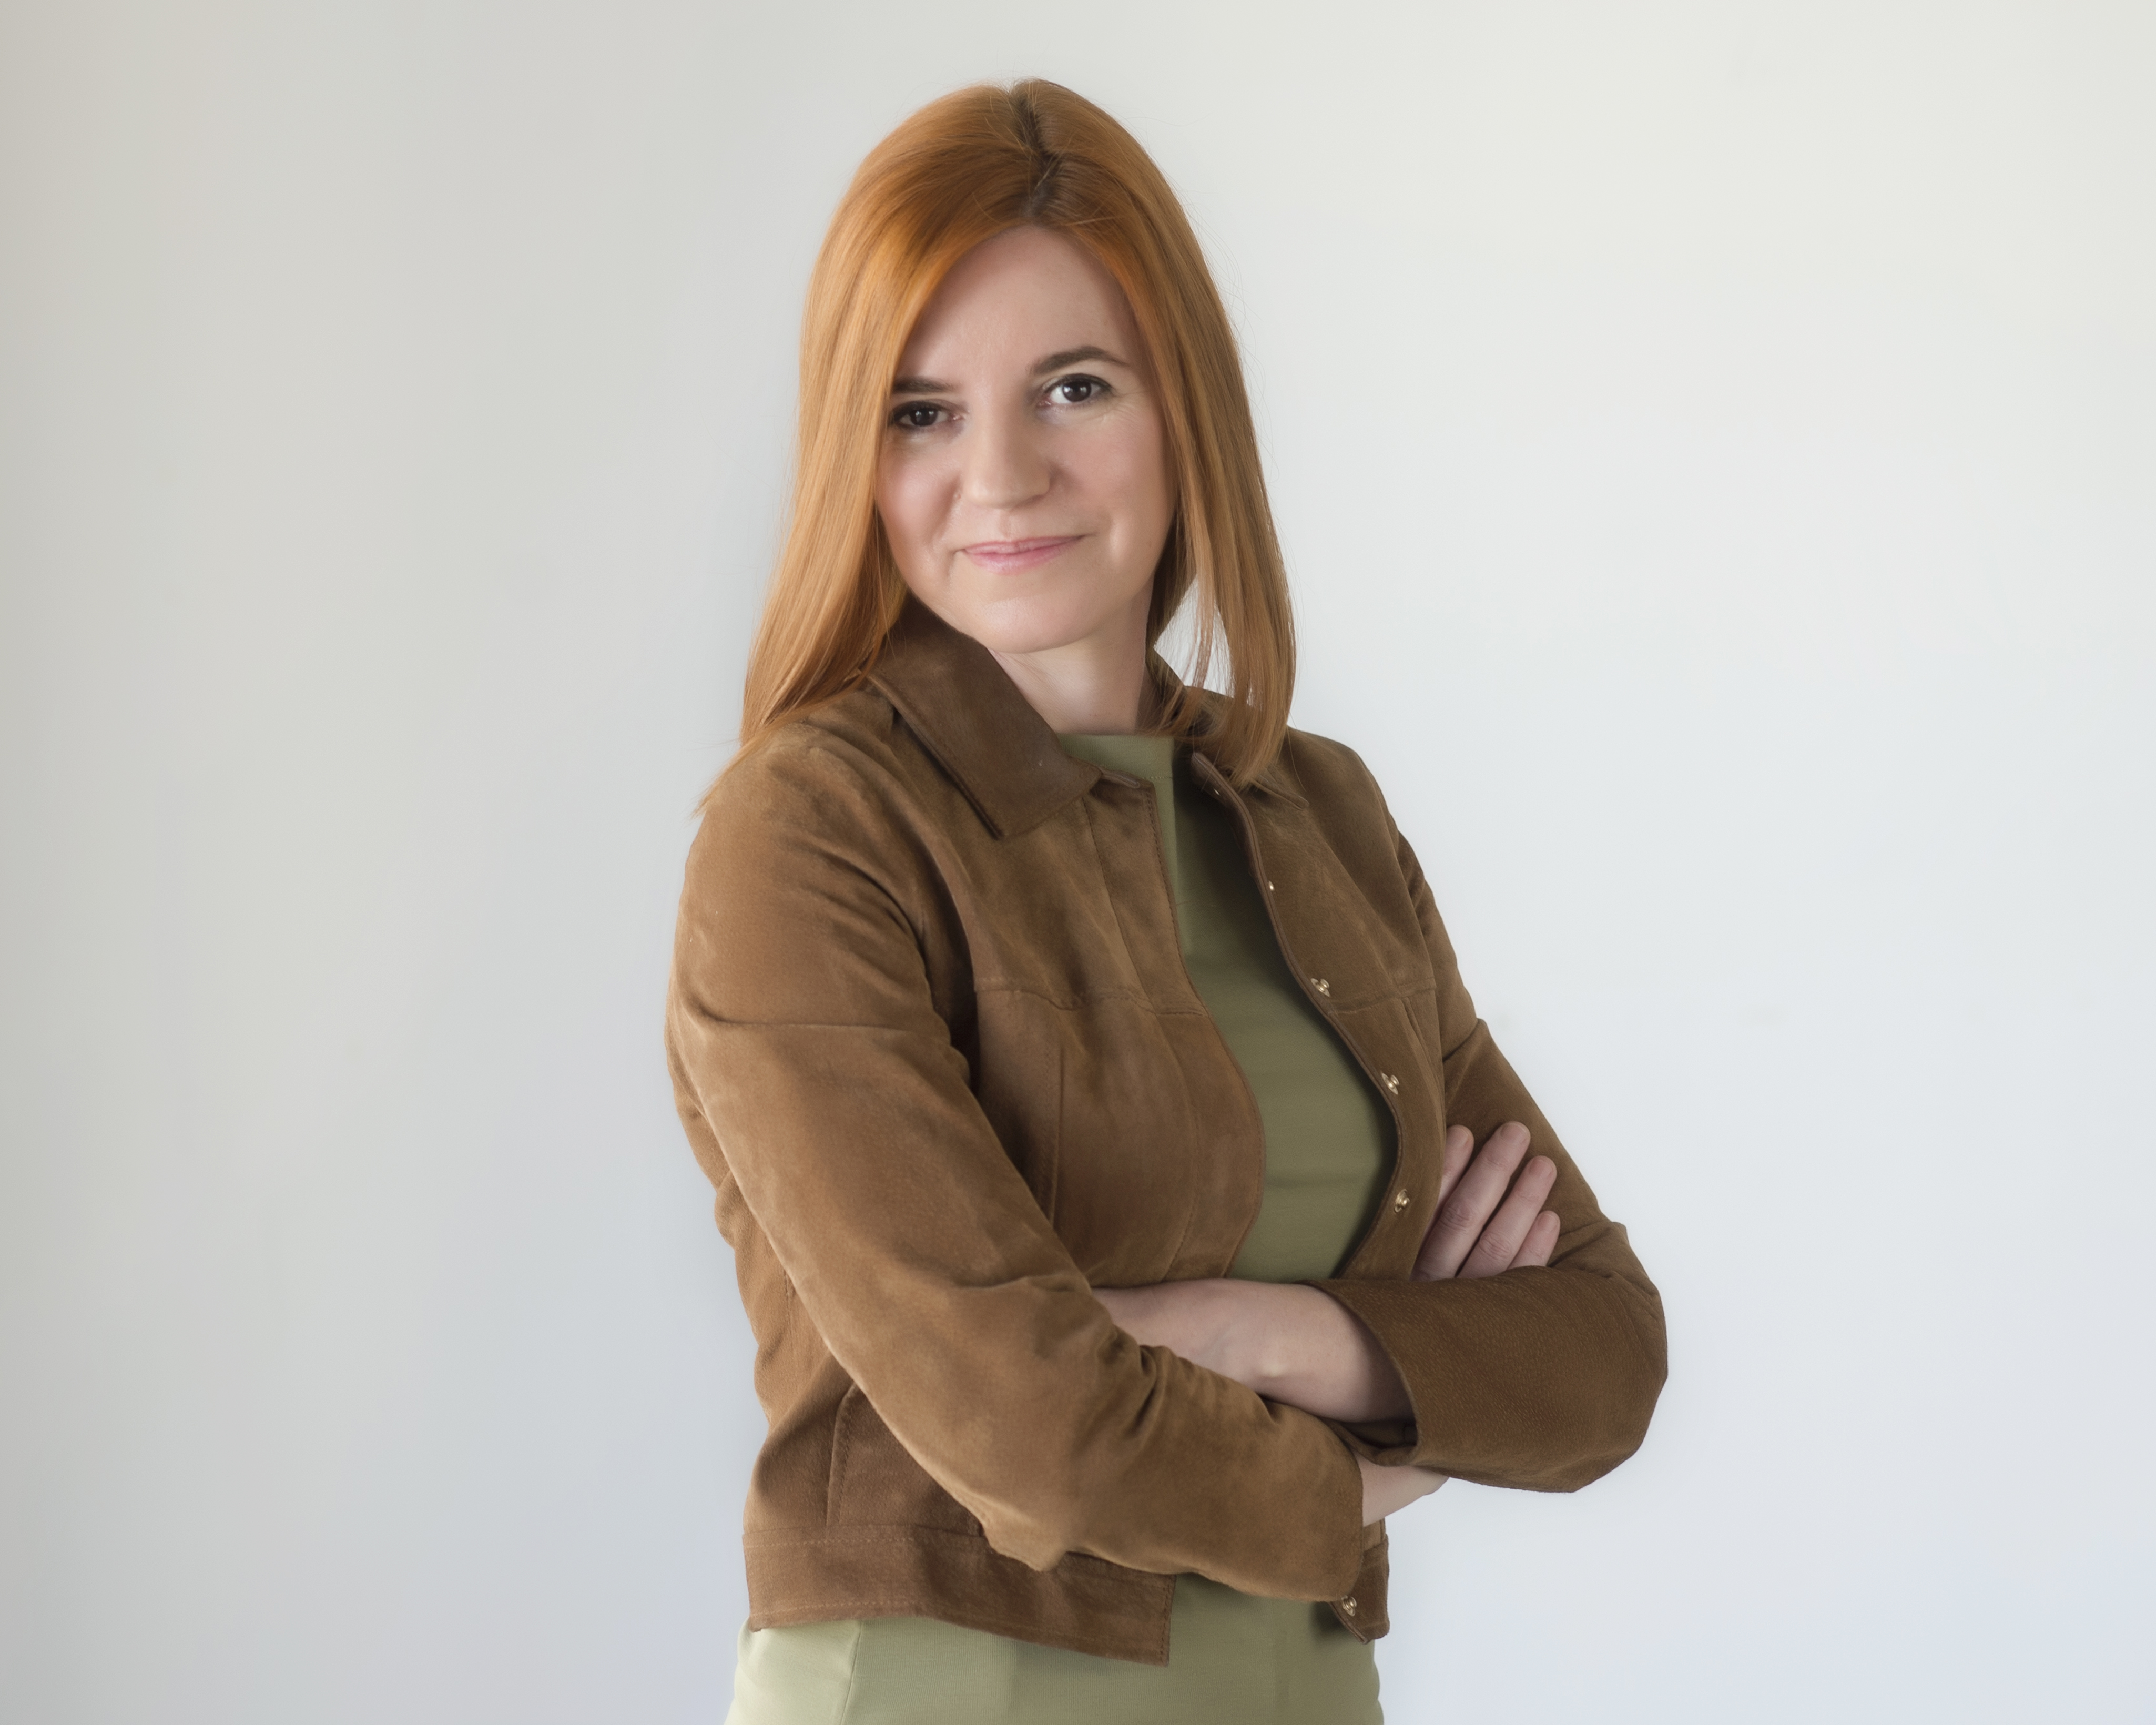 redactor de contenidos online